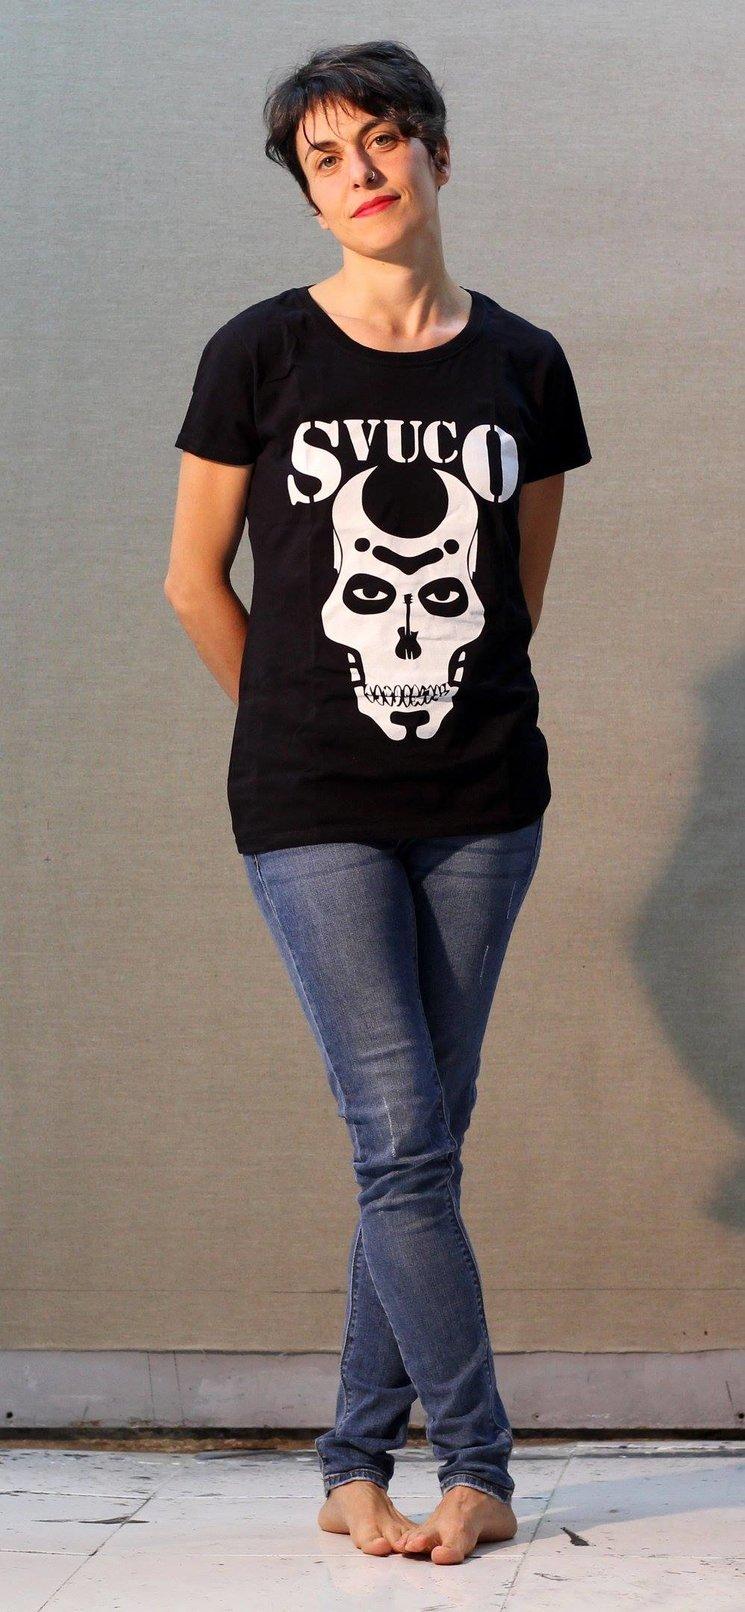 Camiseta Svuco Mujer